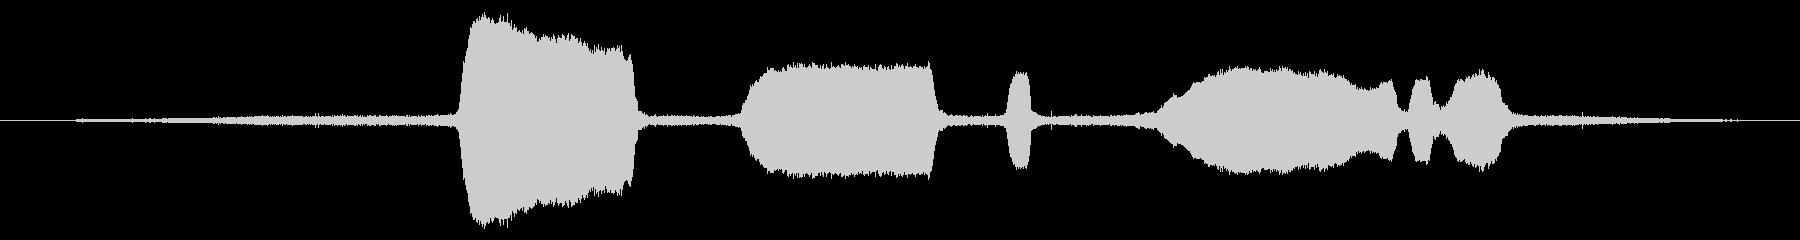 Steamトレイン:Ext:Idl...の未再生の波形